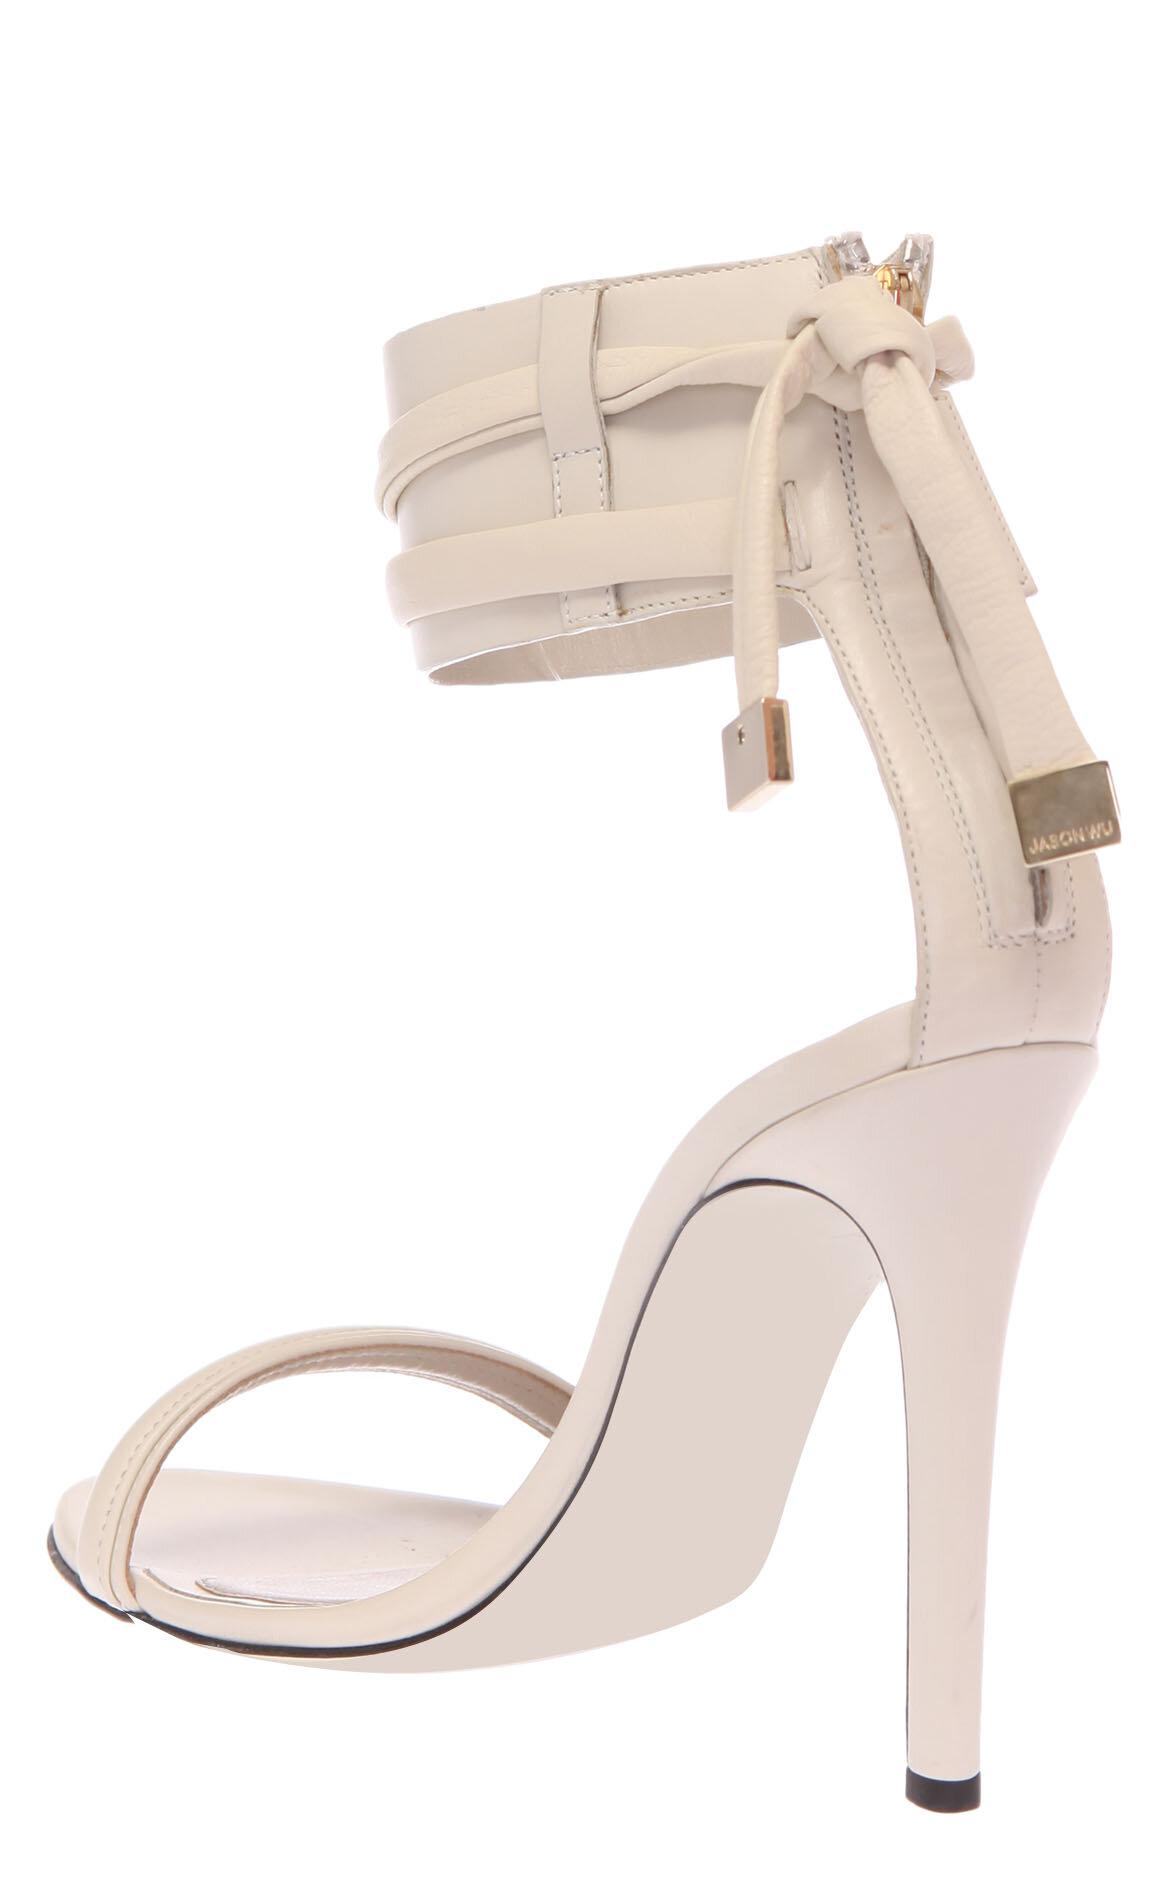 Jason Wu Kadın Krem Rengi Elbise JWUR157030A-CHALK - Brandroom